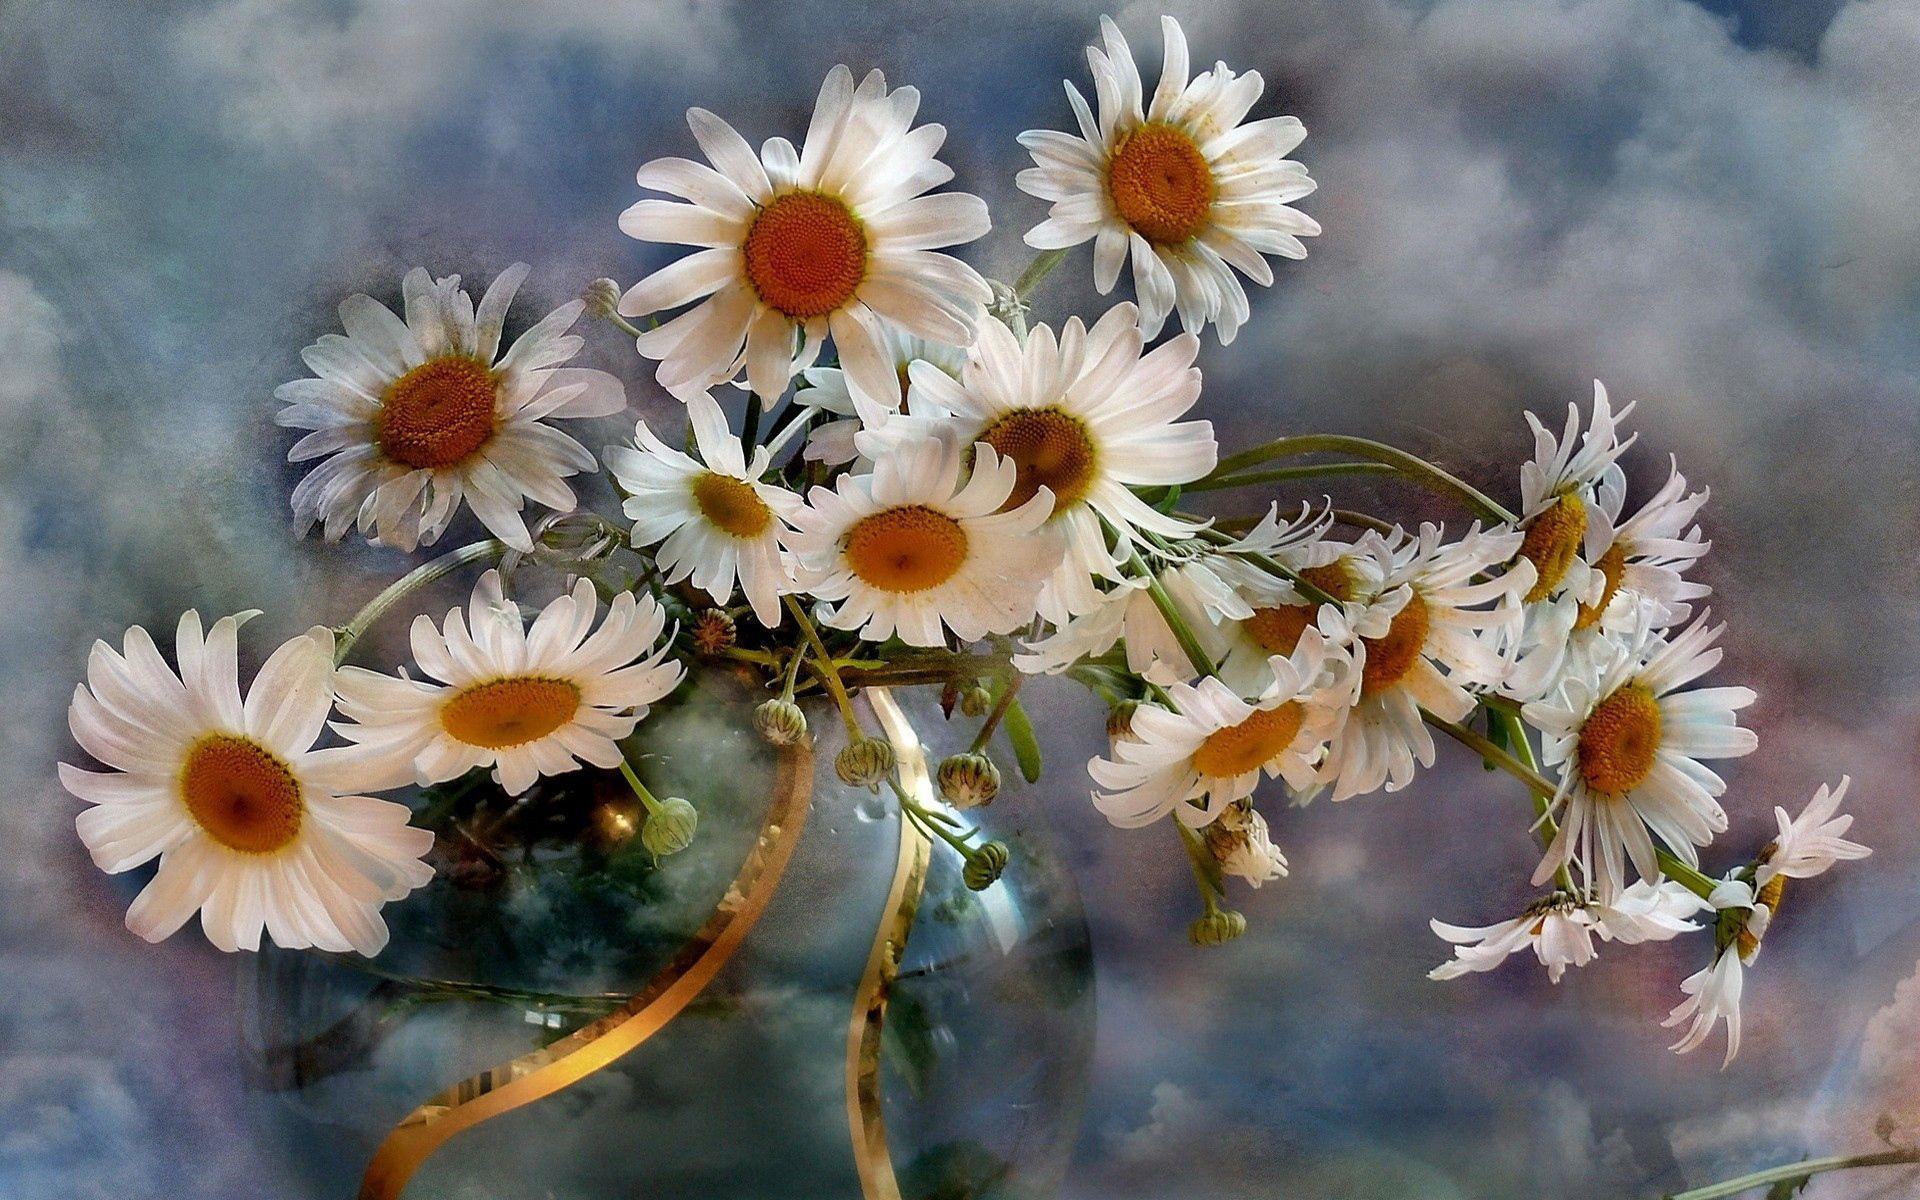 156270 Заставки и Обои Ромашки на телефон. Скачать Цветы, Ромашки, Букет, Ваза, Небо, Облака, Фон картинки бесплатно